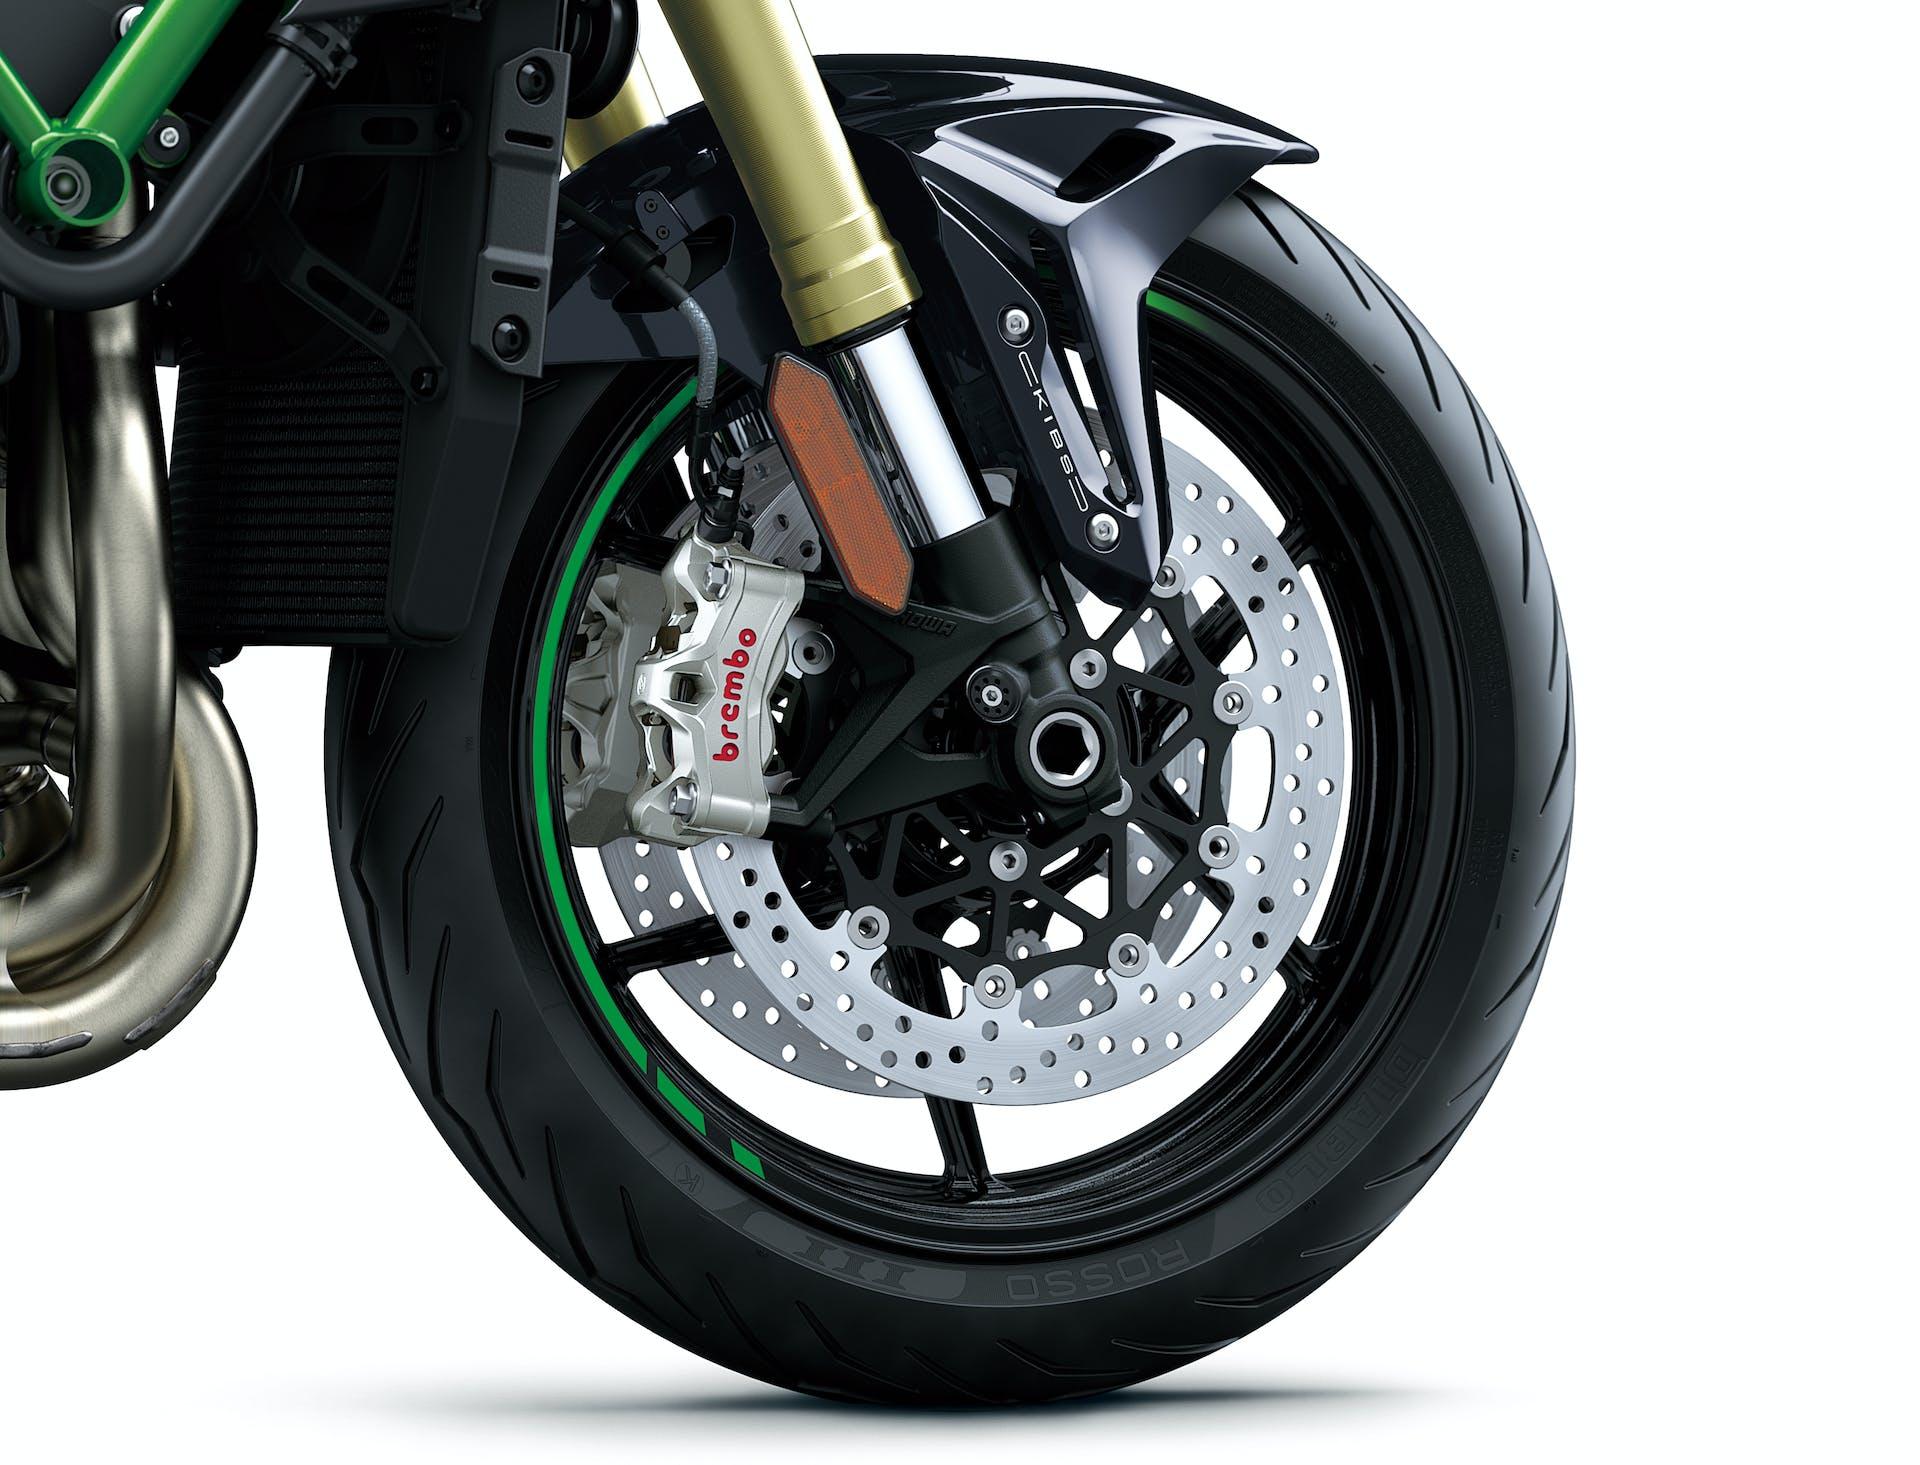 Pinze radiali monoblocco Brembo Stylema Kawasaki Z H2 SE